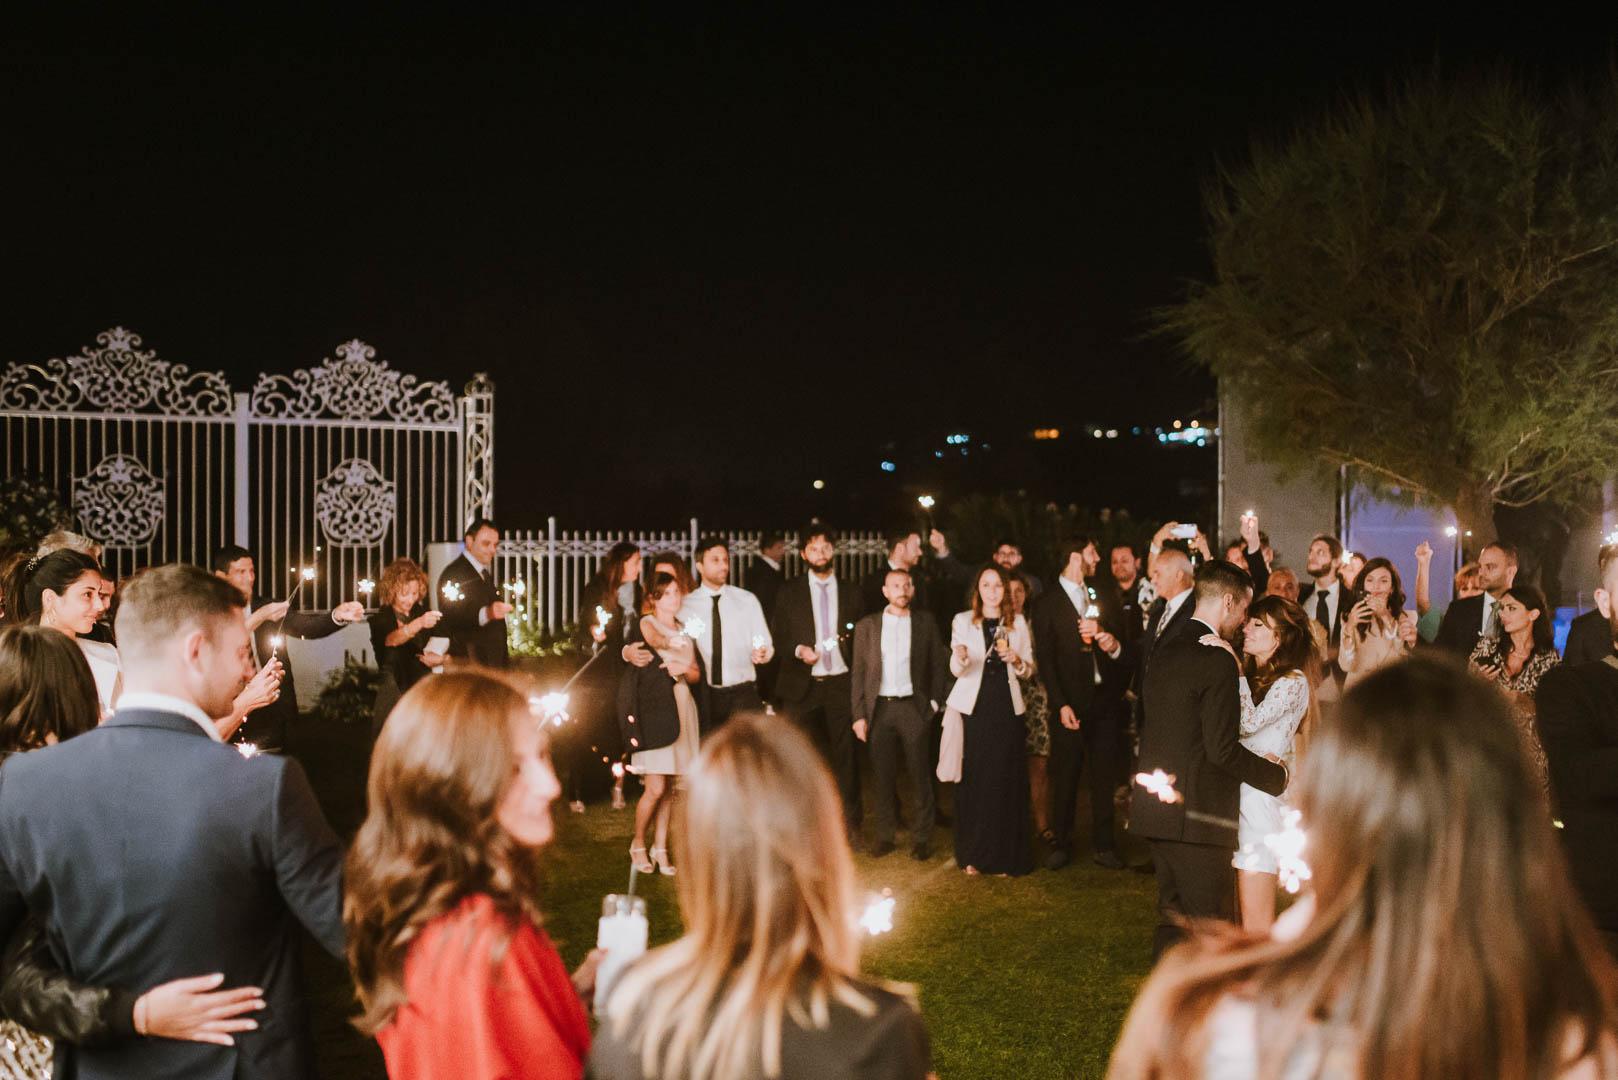 wedding-photographer-destination-fineart-bespoke-reportage-napoli-nabilah-vivianeizzo-spazio46-200